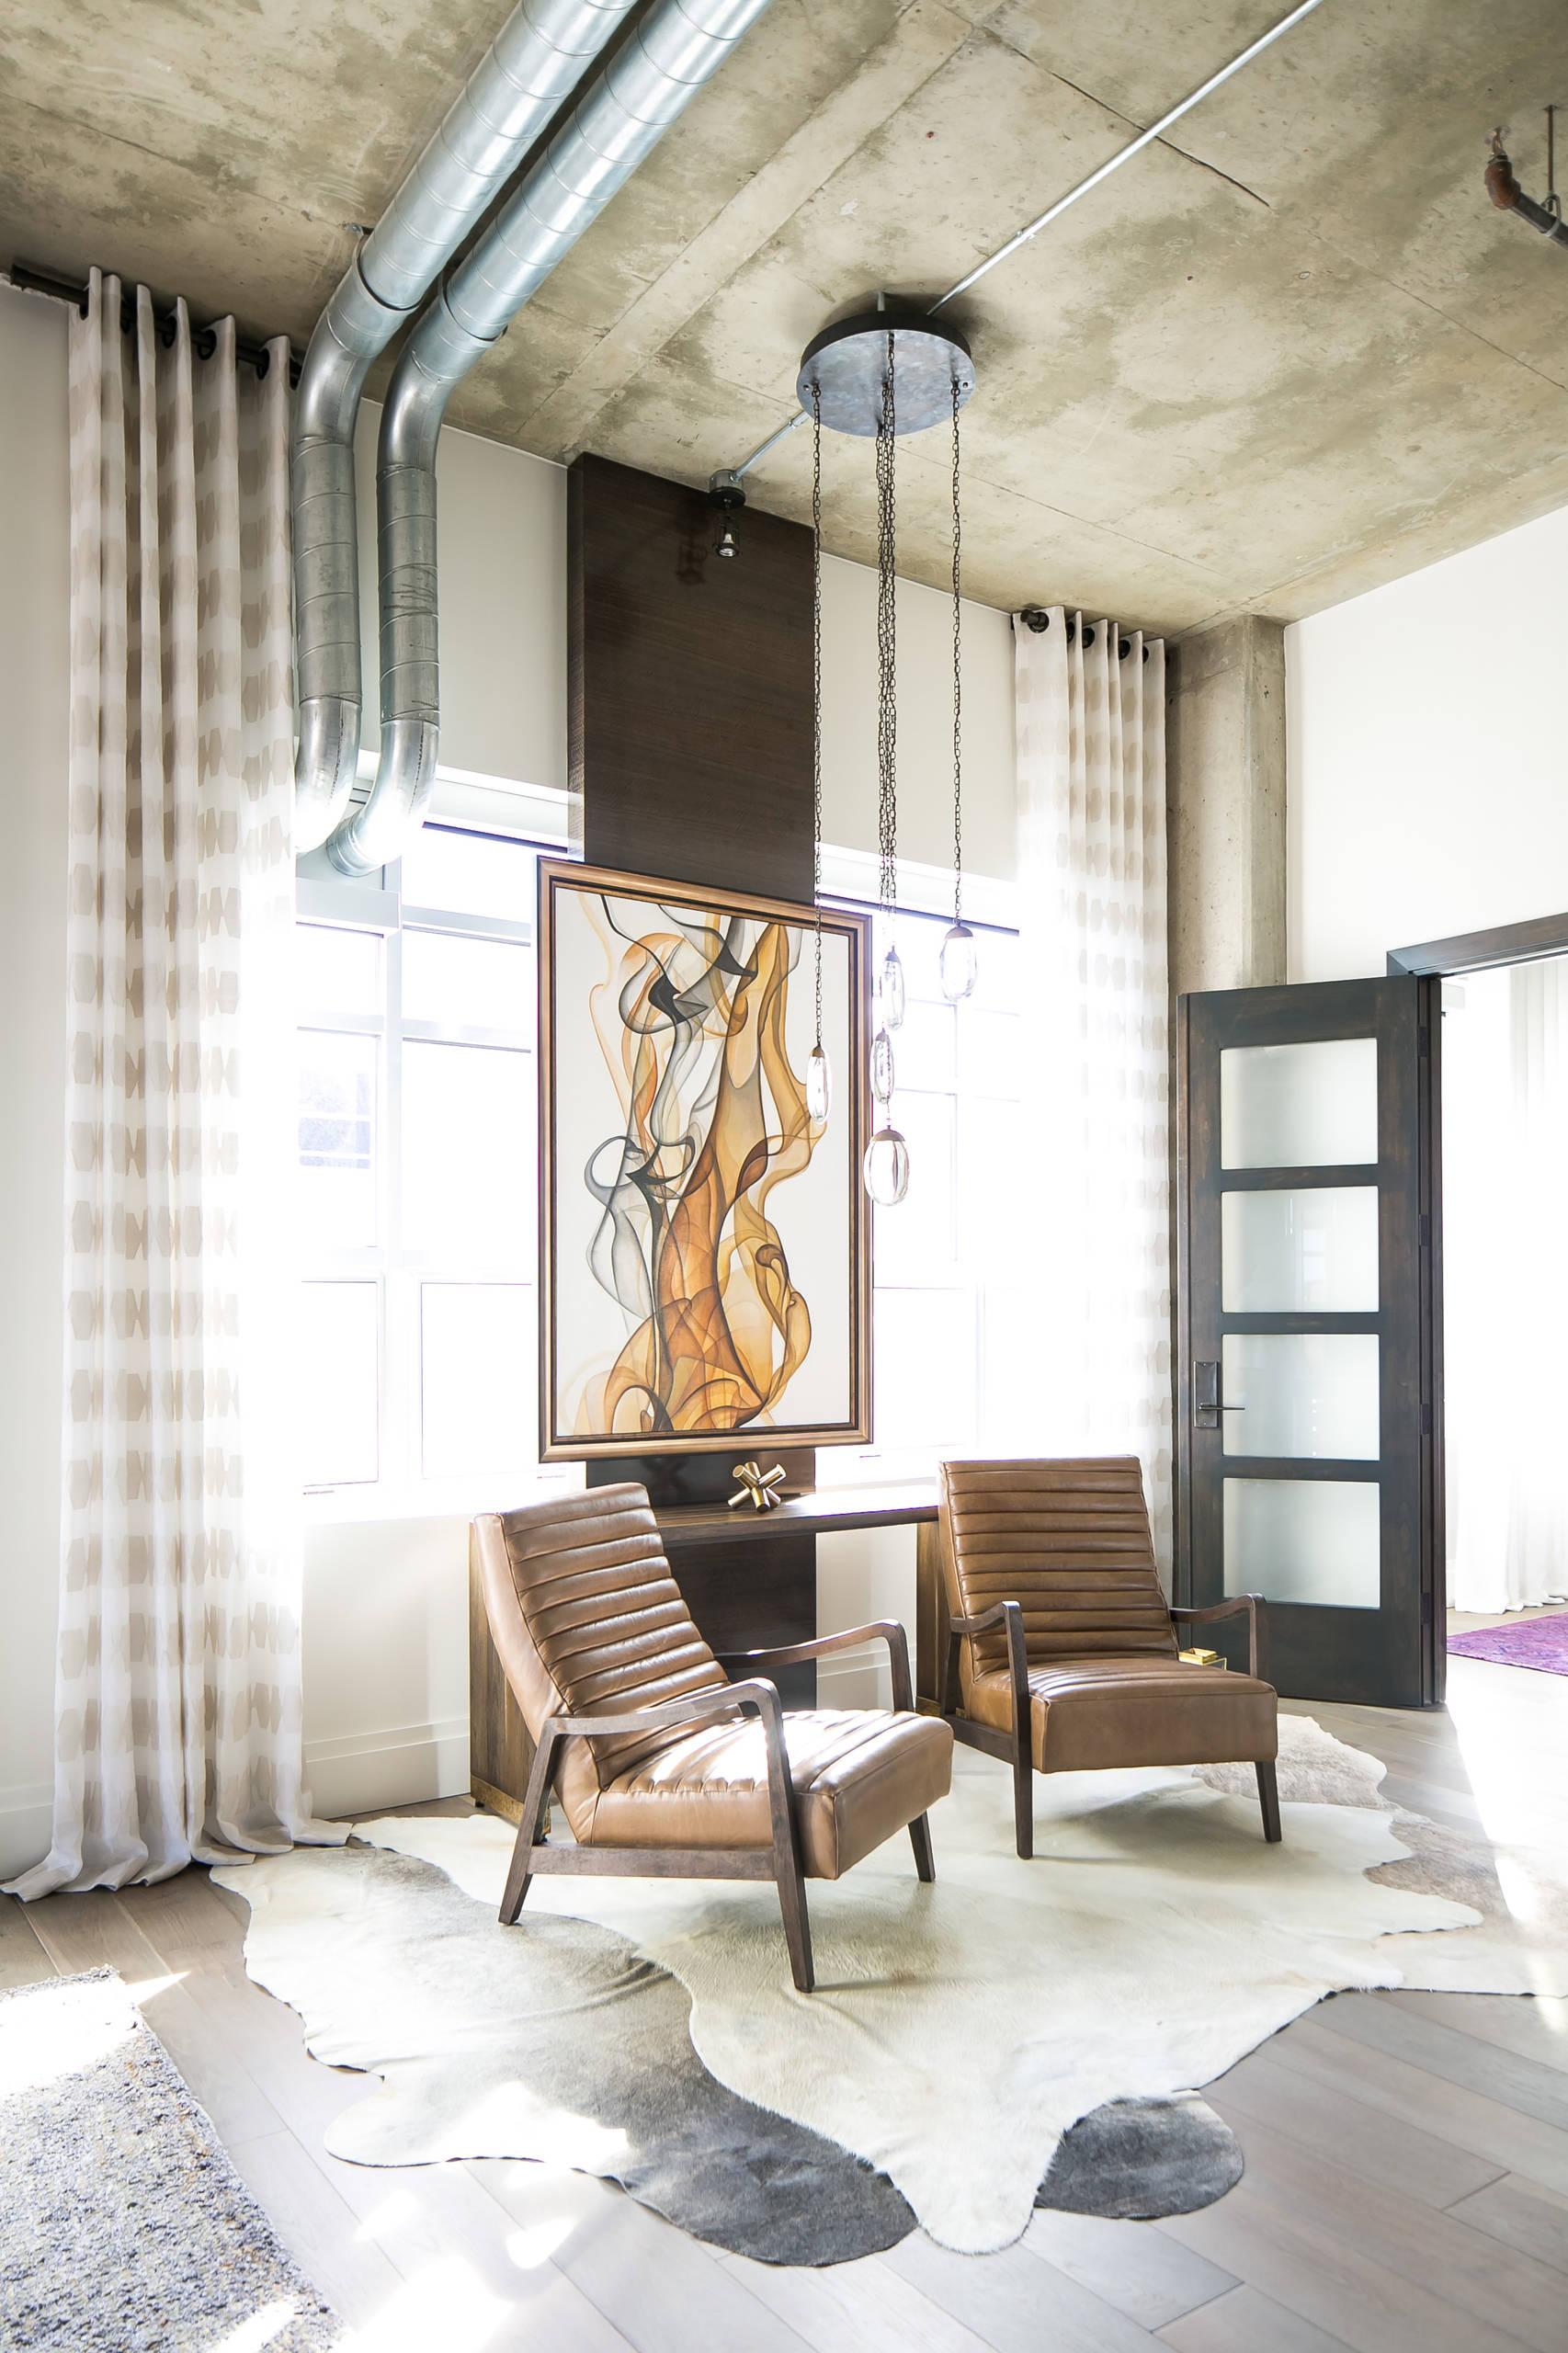 Denver Colorado Residence Loft Style ENTRY LOUNGE